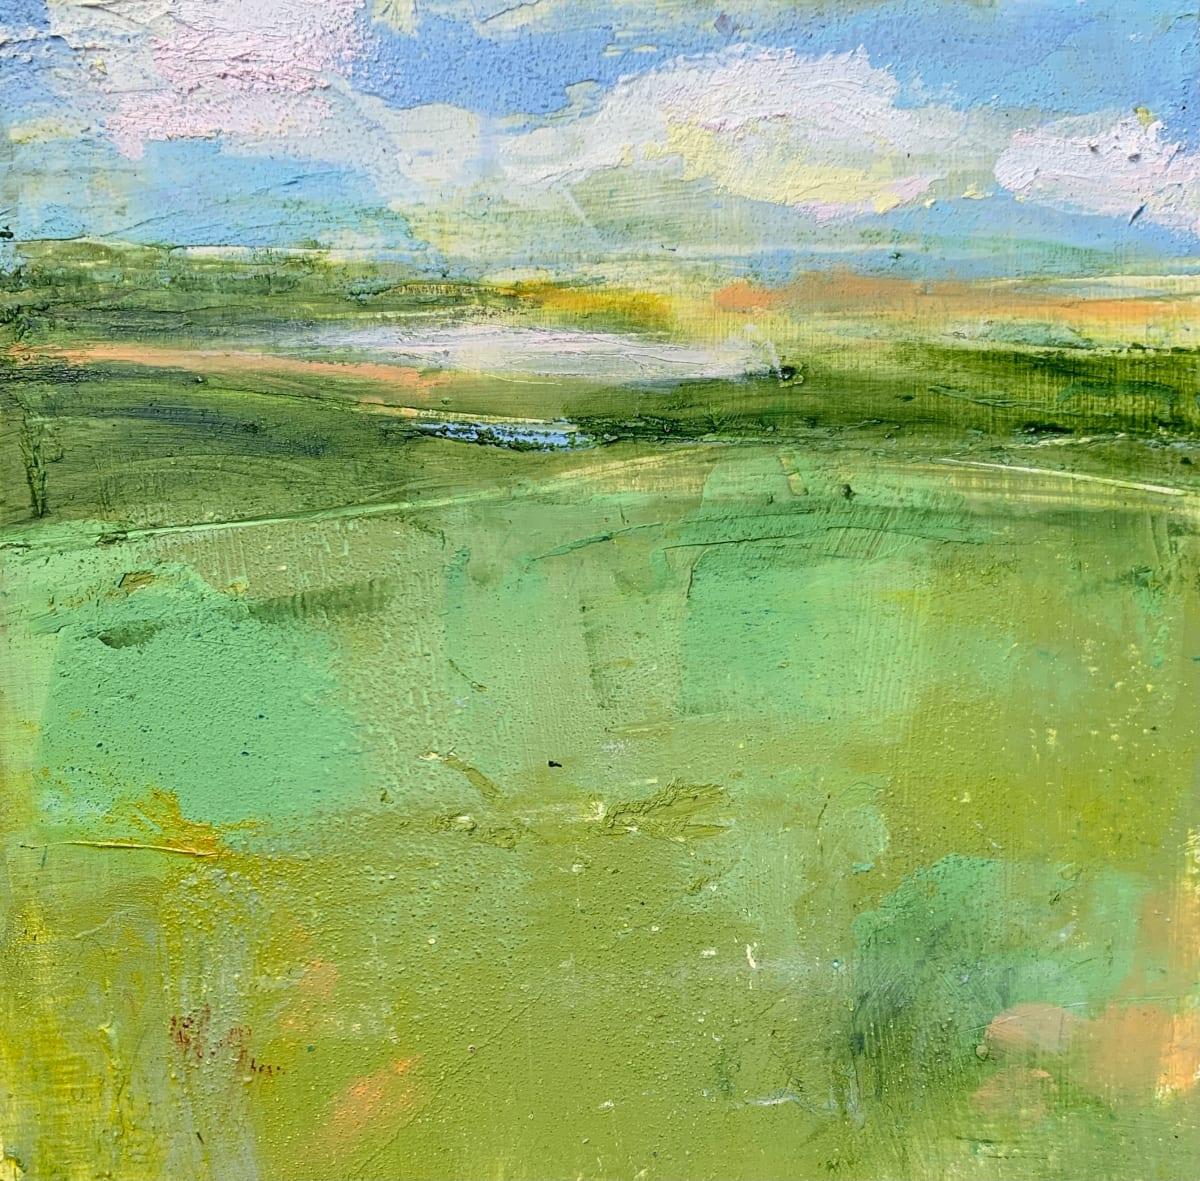 Little Landscape #3 by Sally Hootnick